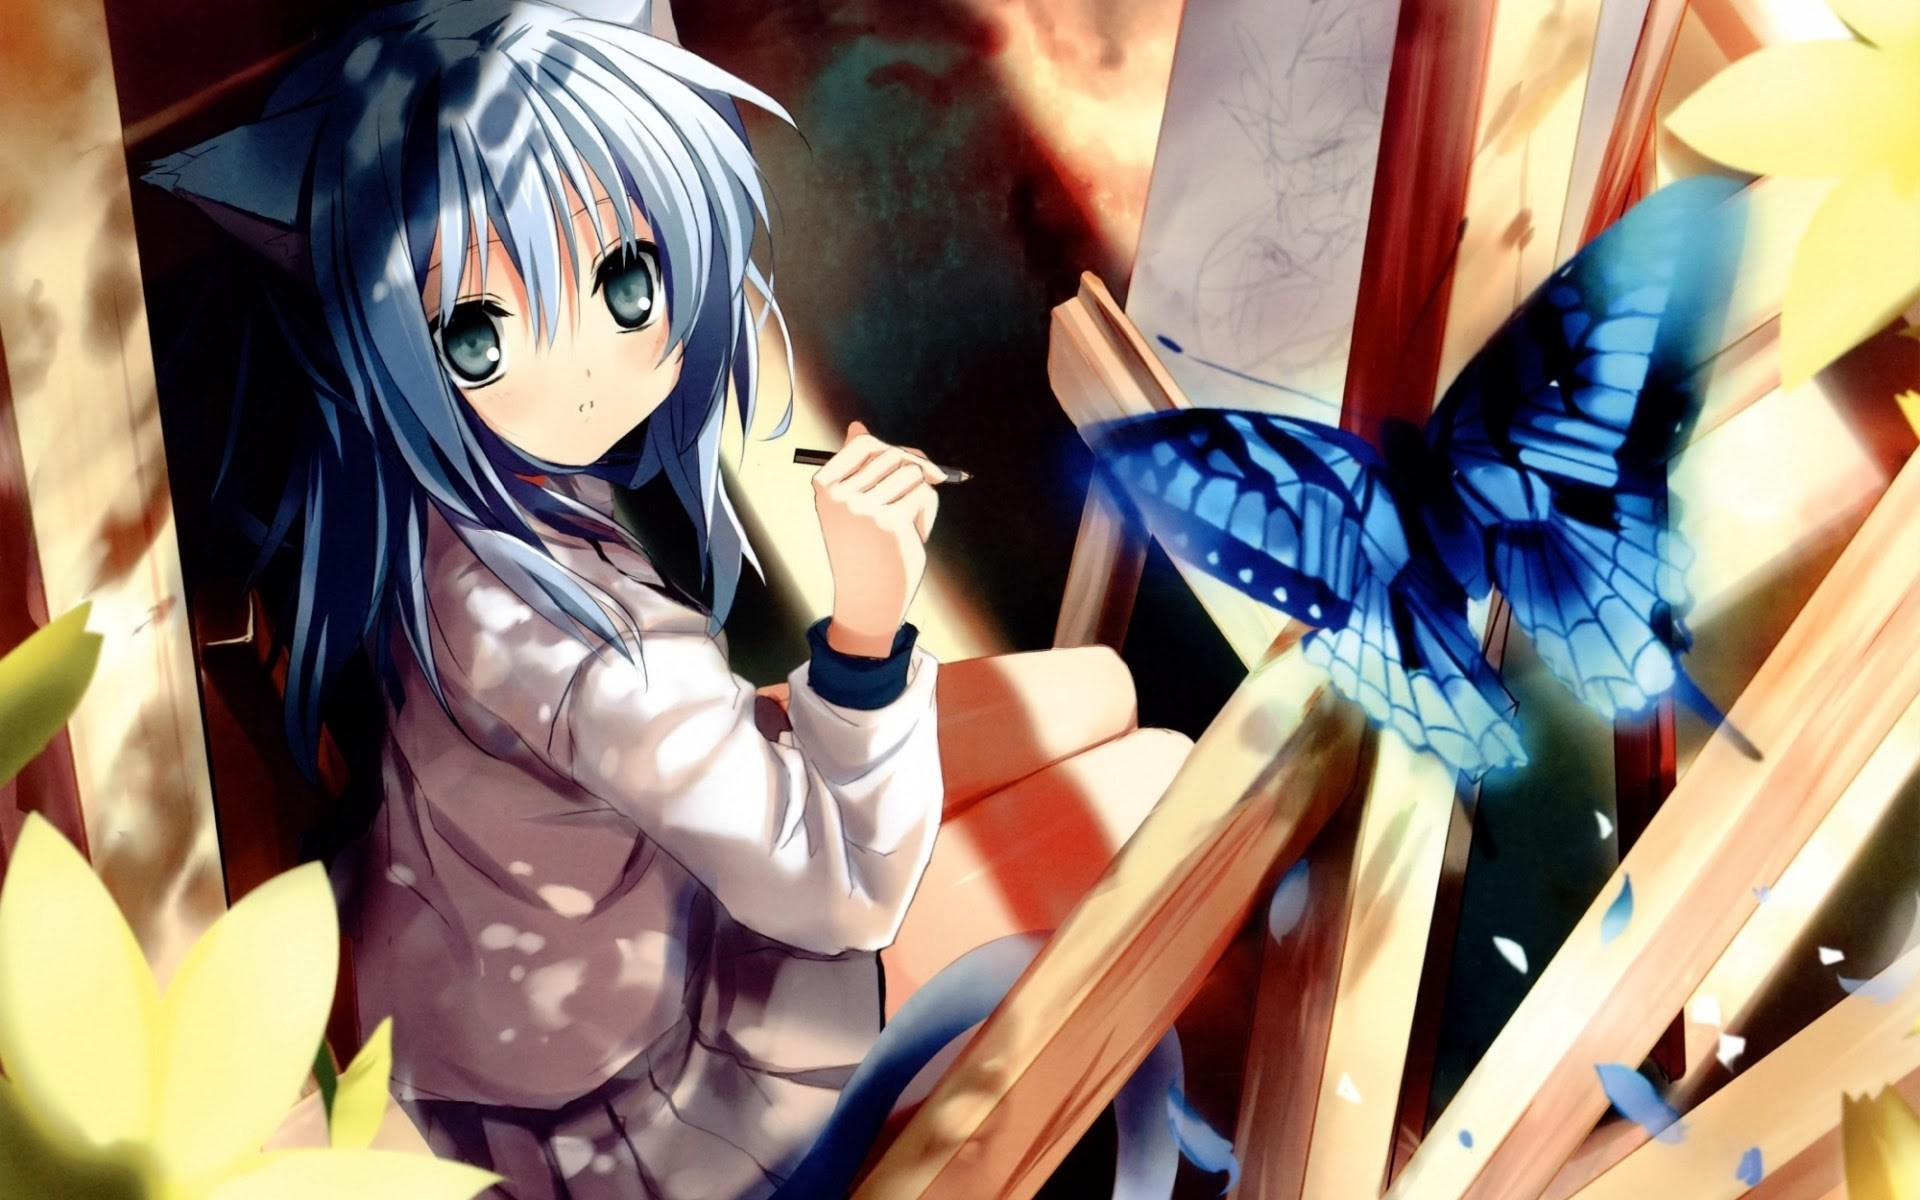 Neko Anime Cat Girl Butterfly Hd Wallpaper 1920 1200 B040